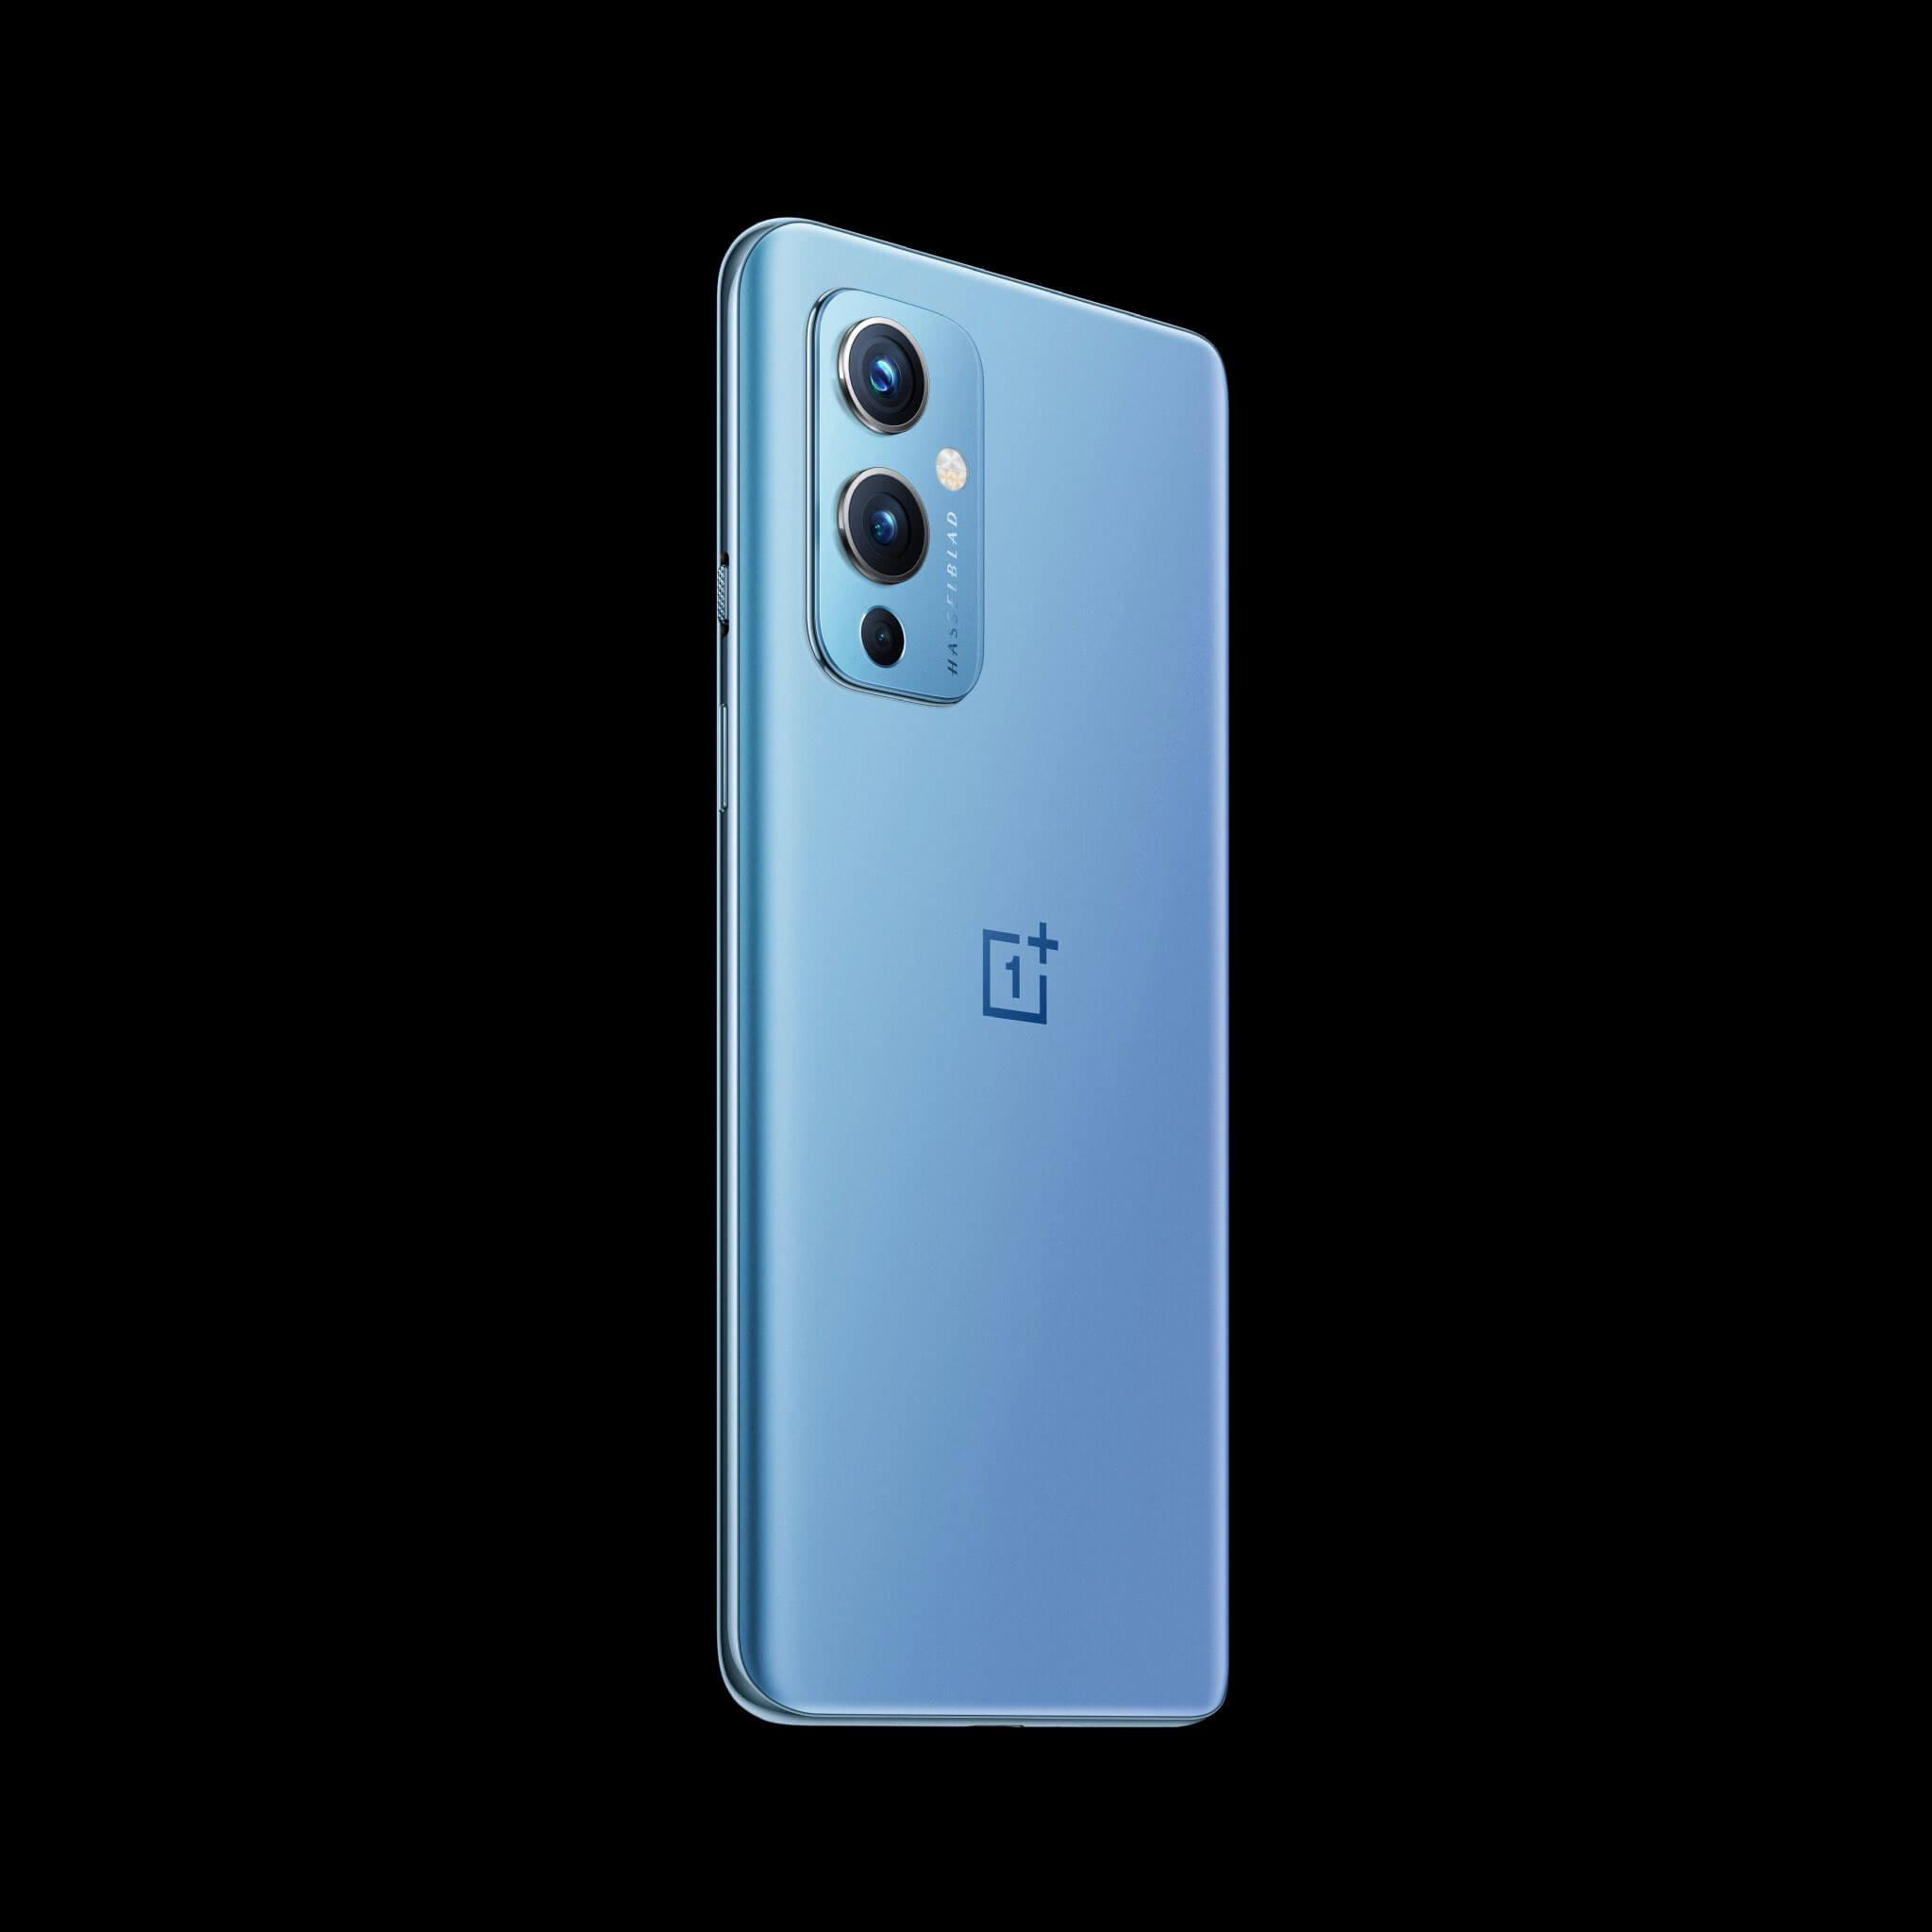 OnePlus 9 ブルー